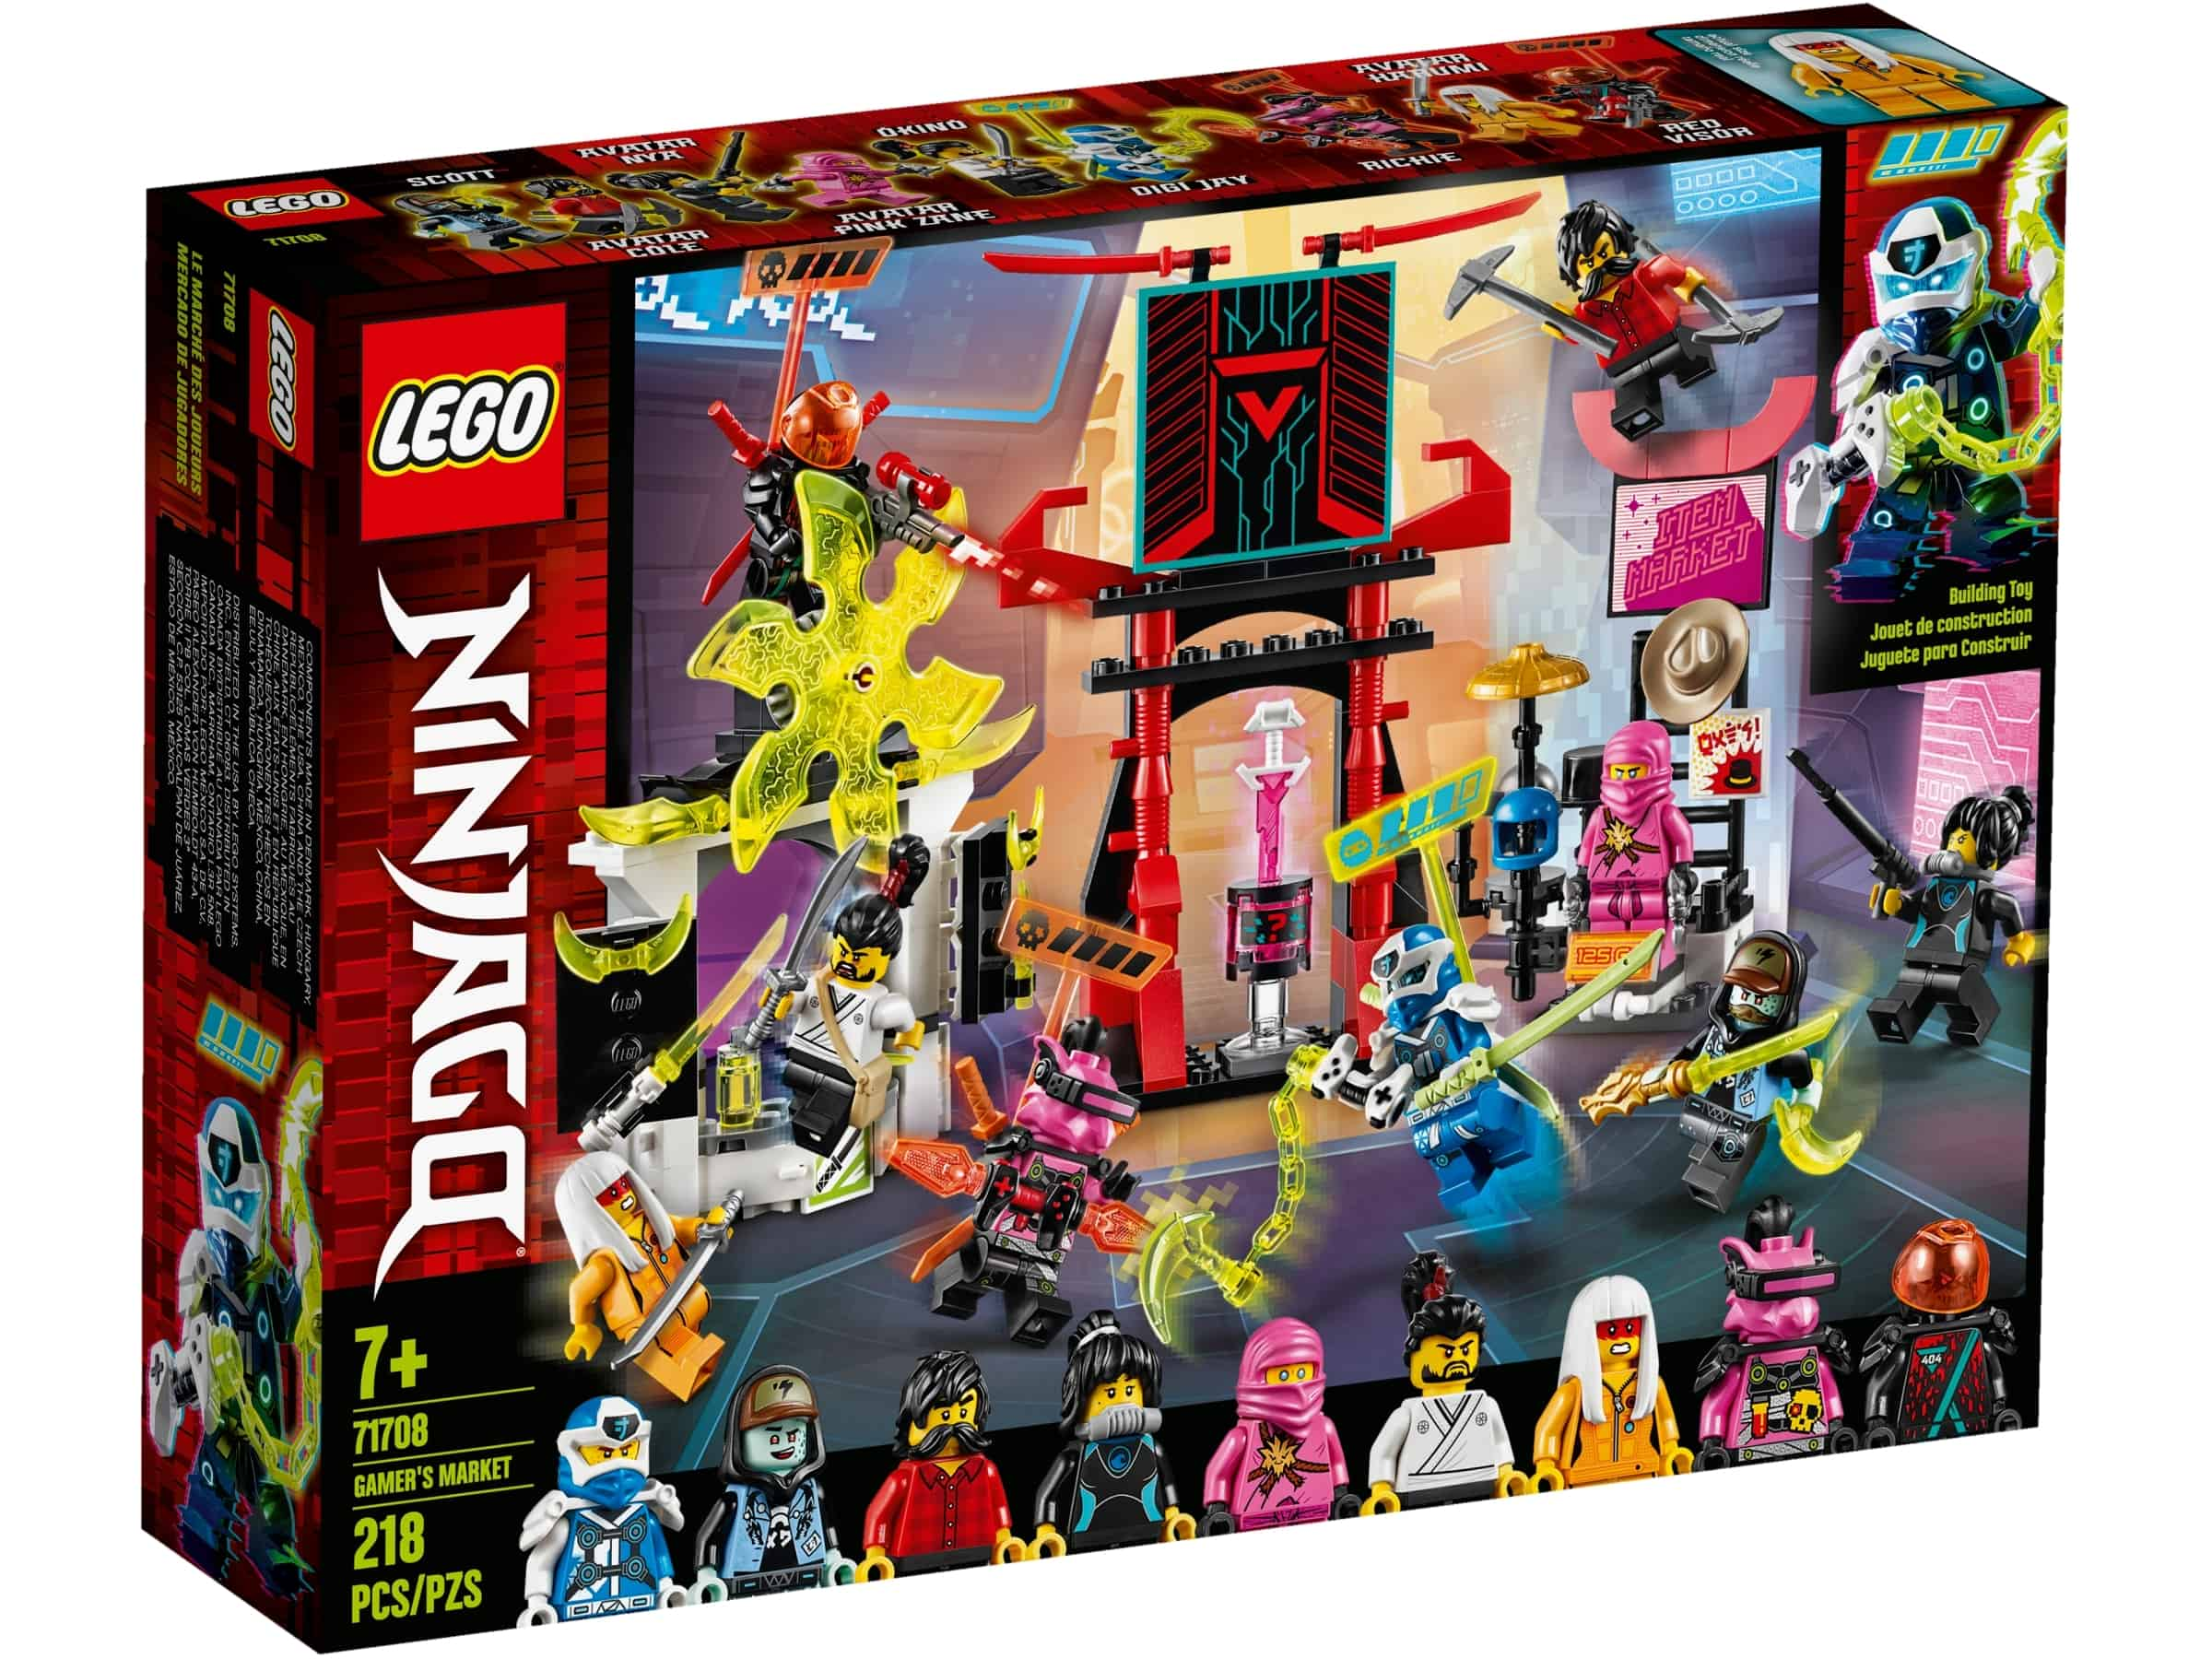 lego 71708 spillers marked